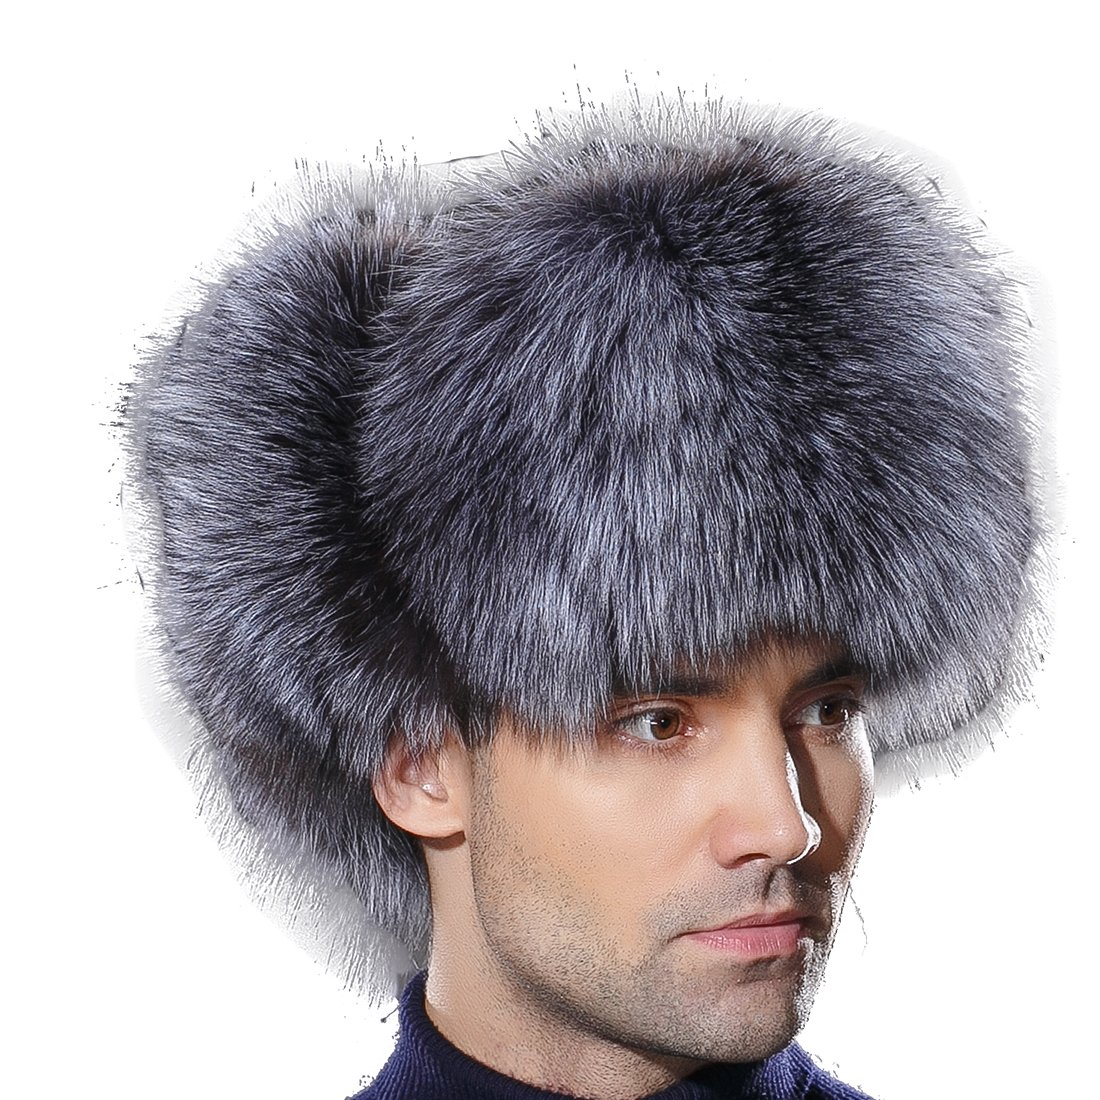 URSFUR Winter Mens Russian Ushanka Hat Real Leather & Silver Fox Fur Trapper Cap